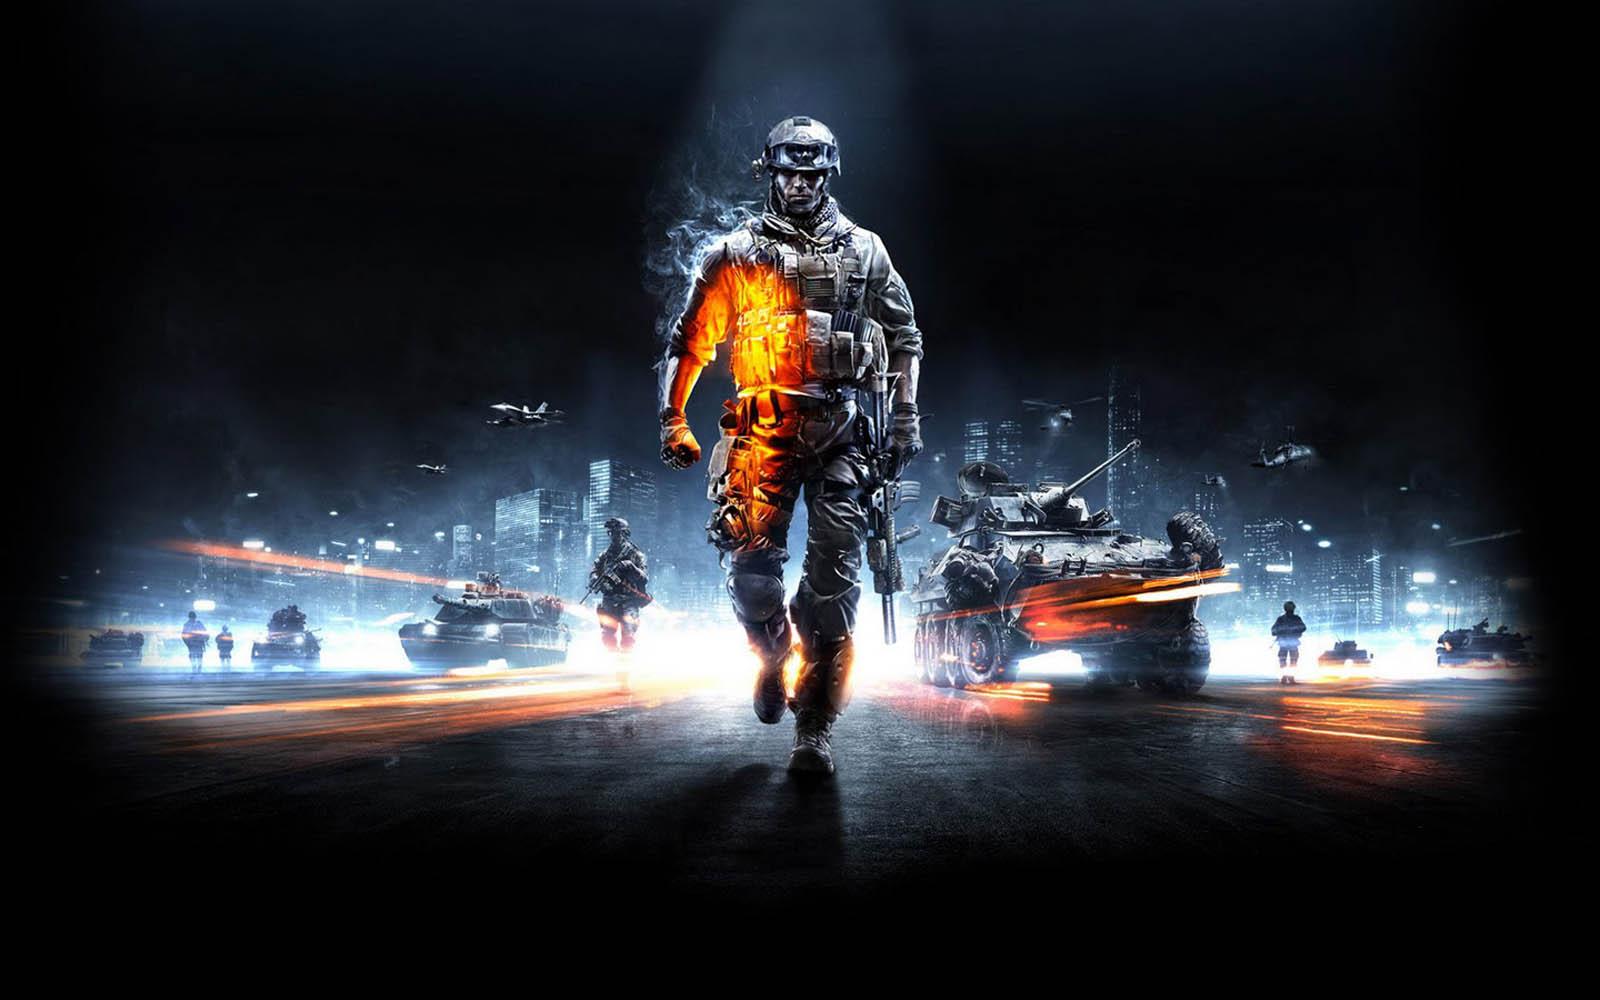 Image Screensaver Free Battlefield 3 Game Desktop Wallpapers